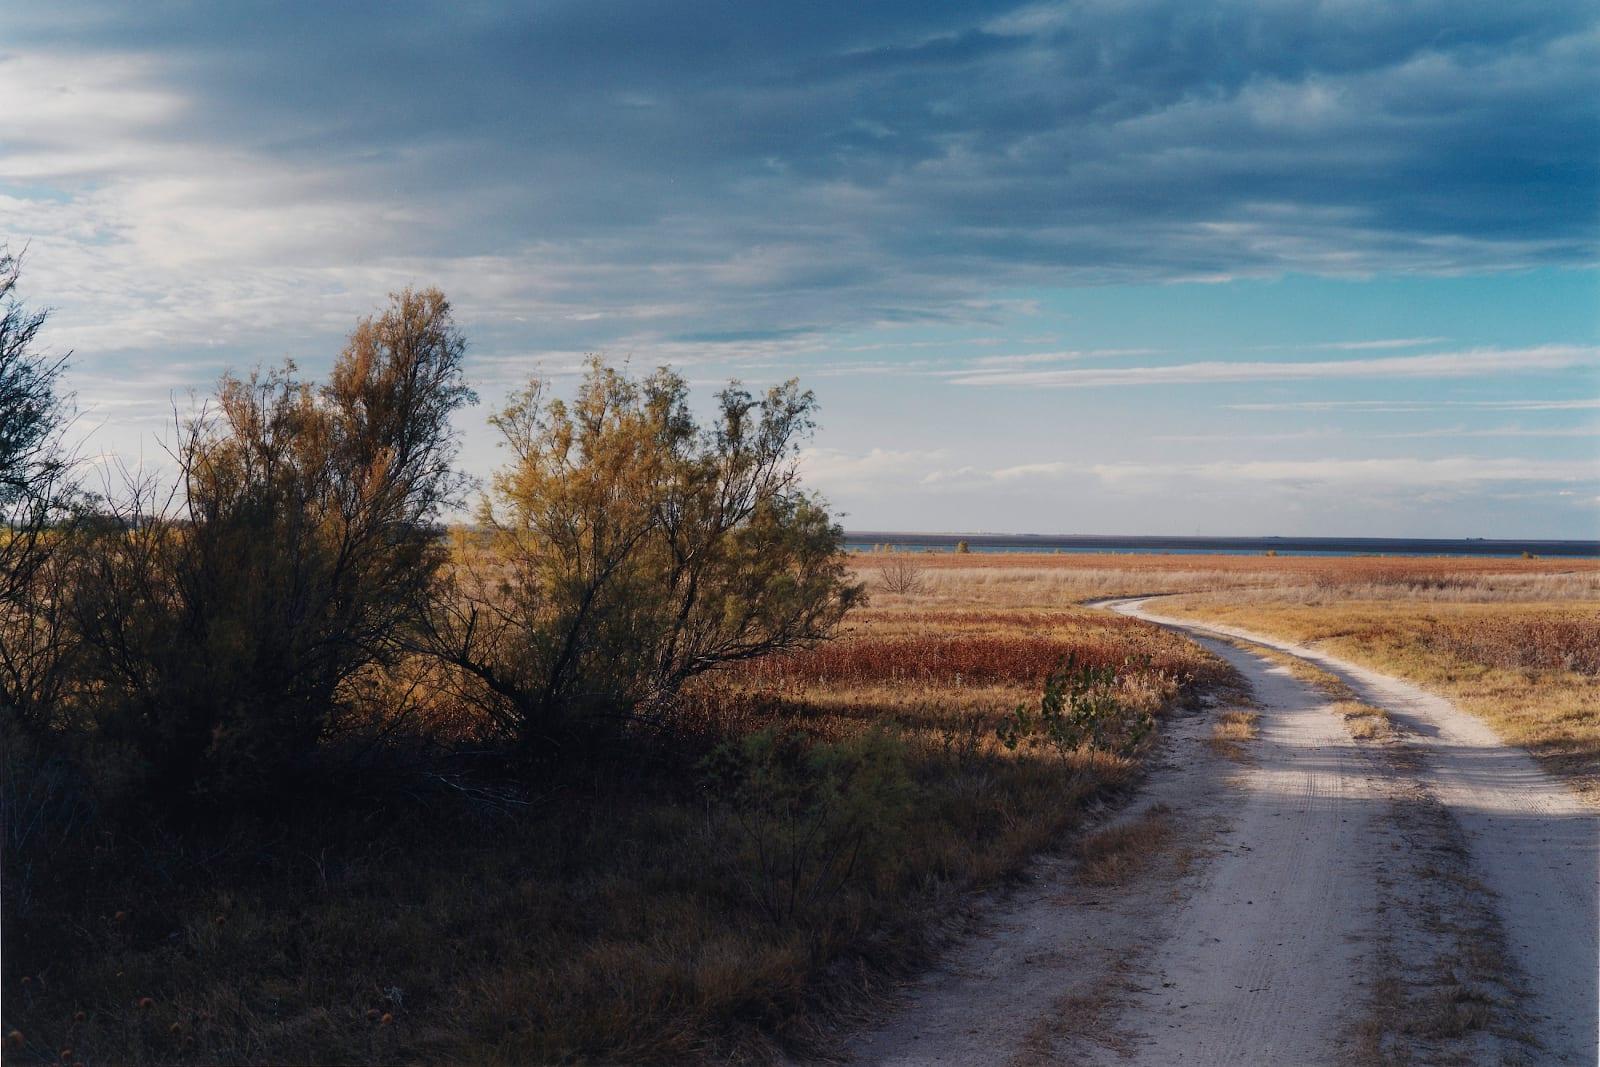 Nee Noshe Reservoir Kiowa County Colorado